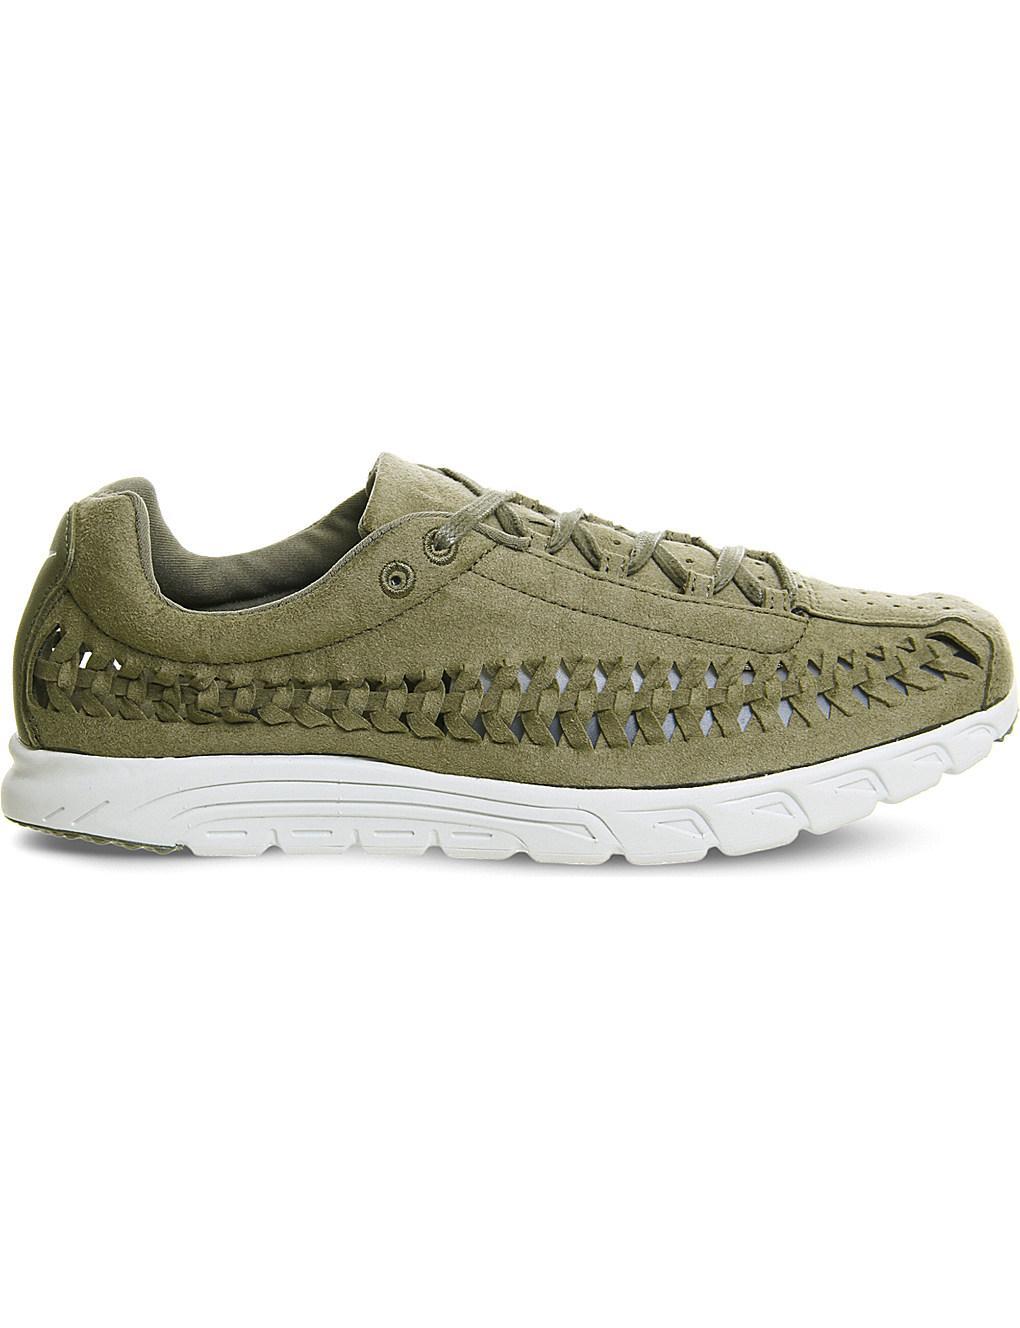 Nike @ Selfridges